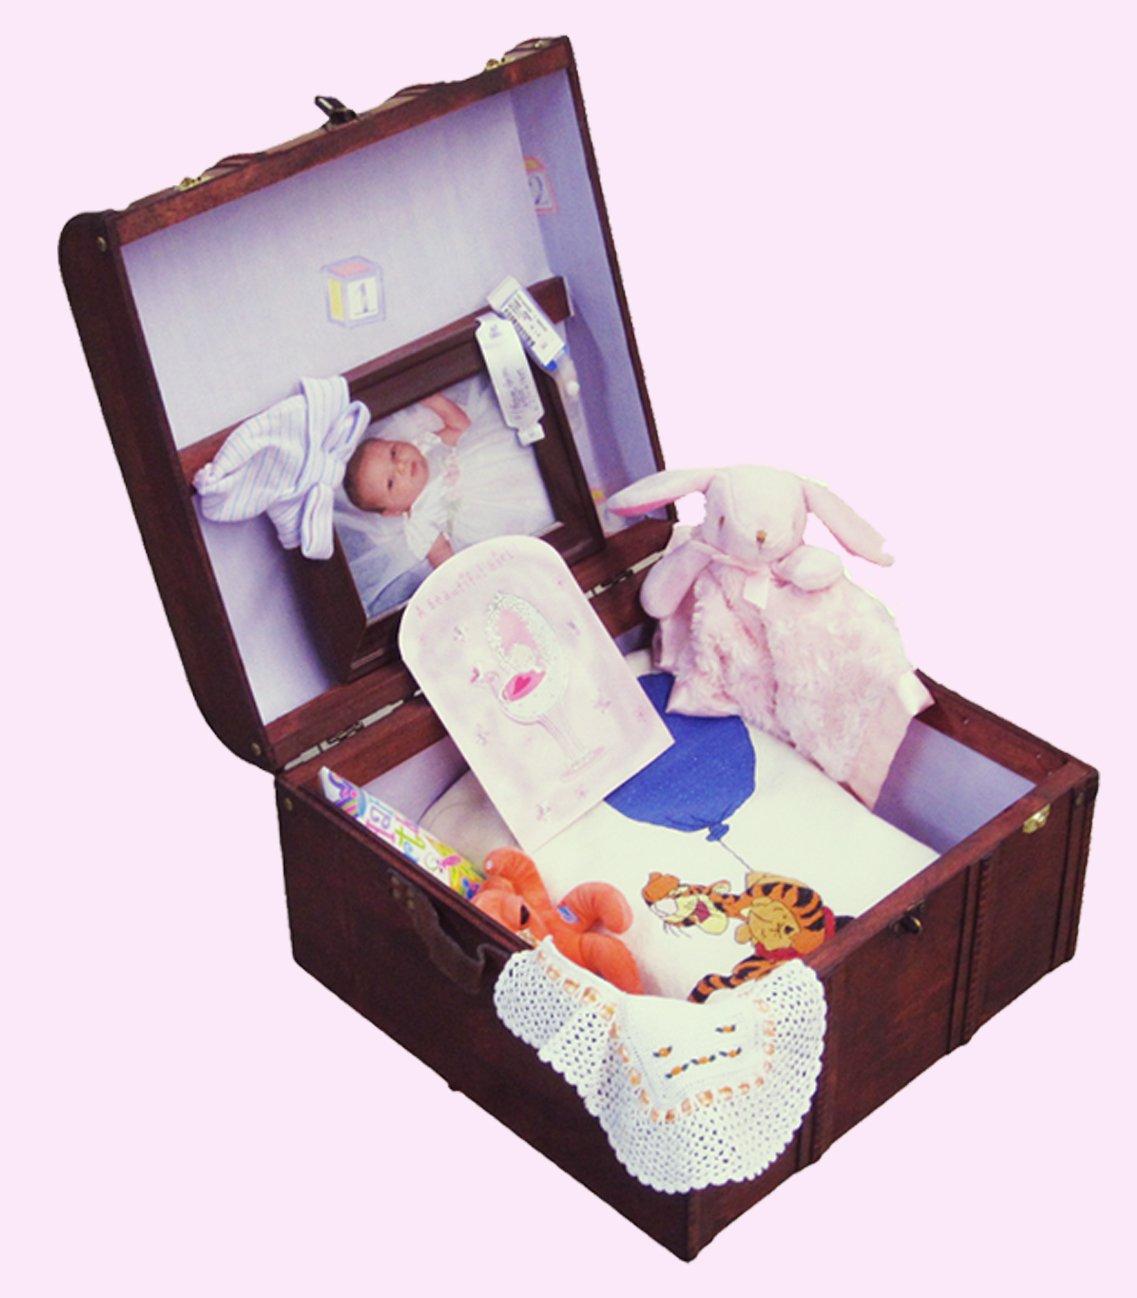 Keene/Fx Newborn Memory Chest - GIRL by Keene/Fx (Image #4)